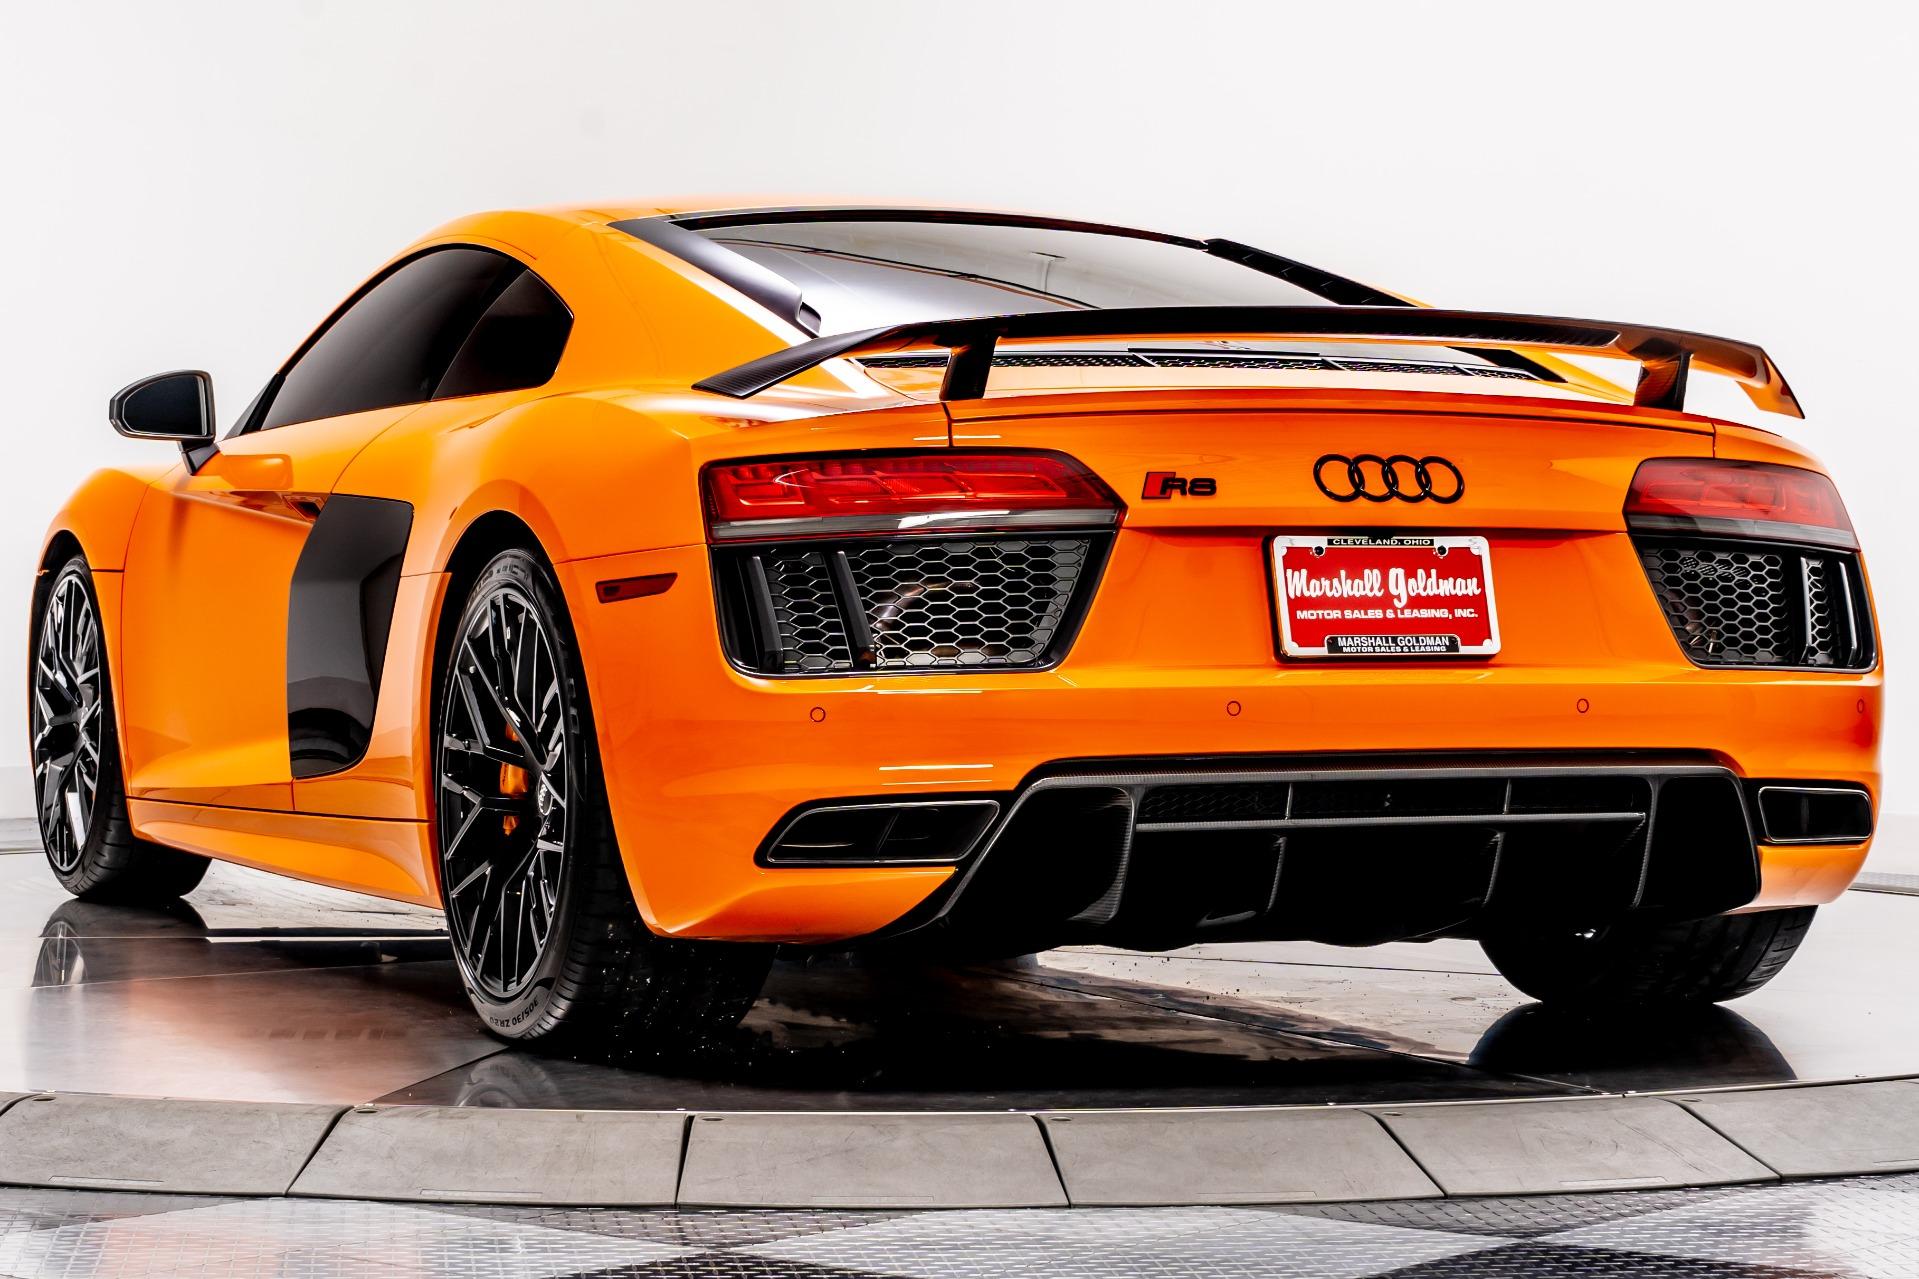 Used 2018 Audi R8 V10 Plus For Sale 174 900 Marshall Goldman Beverly Hills Stock W21356